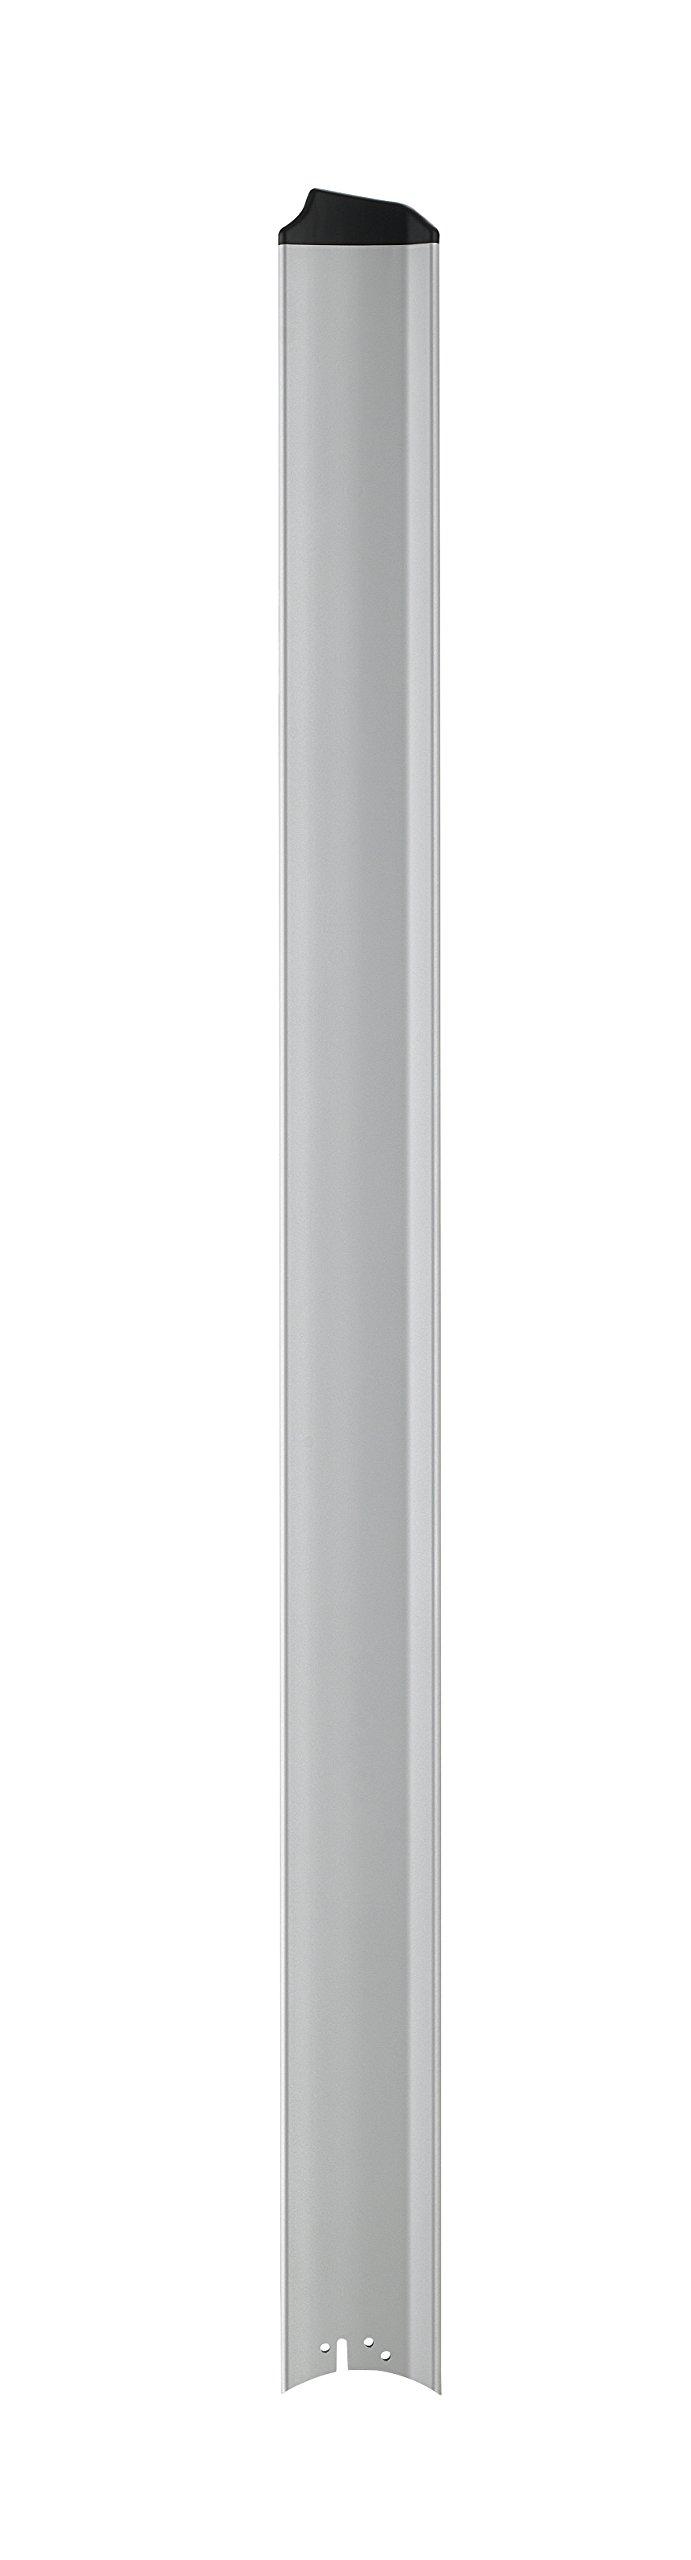 Fanimation B7998-96SLW Fan Blades Set (Set of 8), Silver with Black Tip